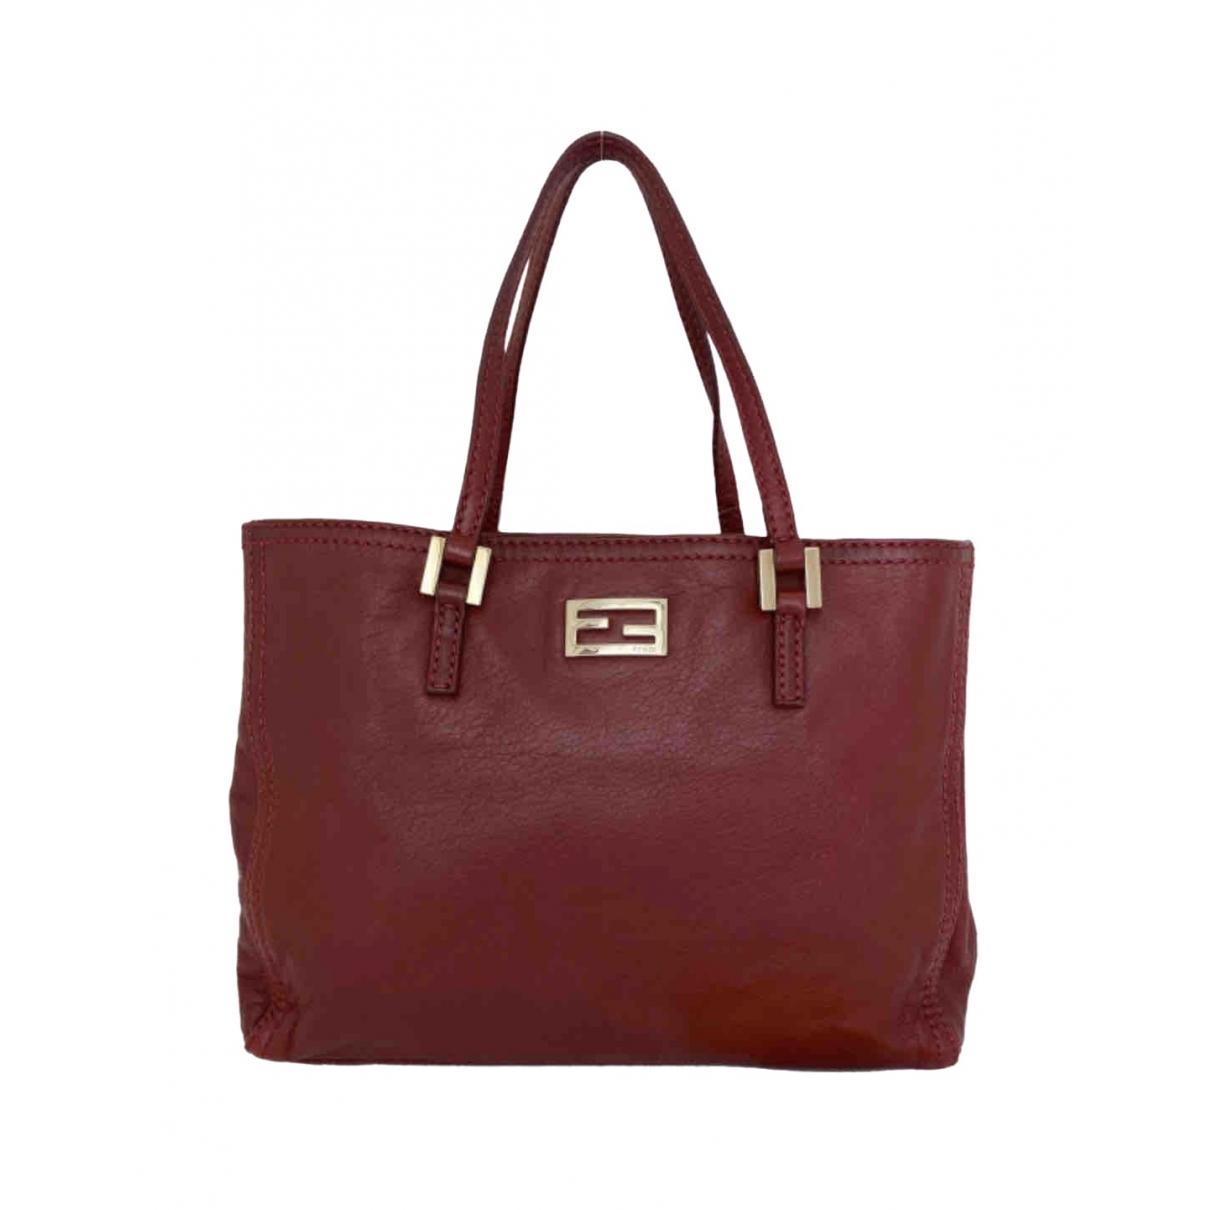 Fendi \N Burgundy Leather handbag for Women \N